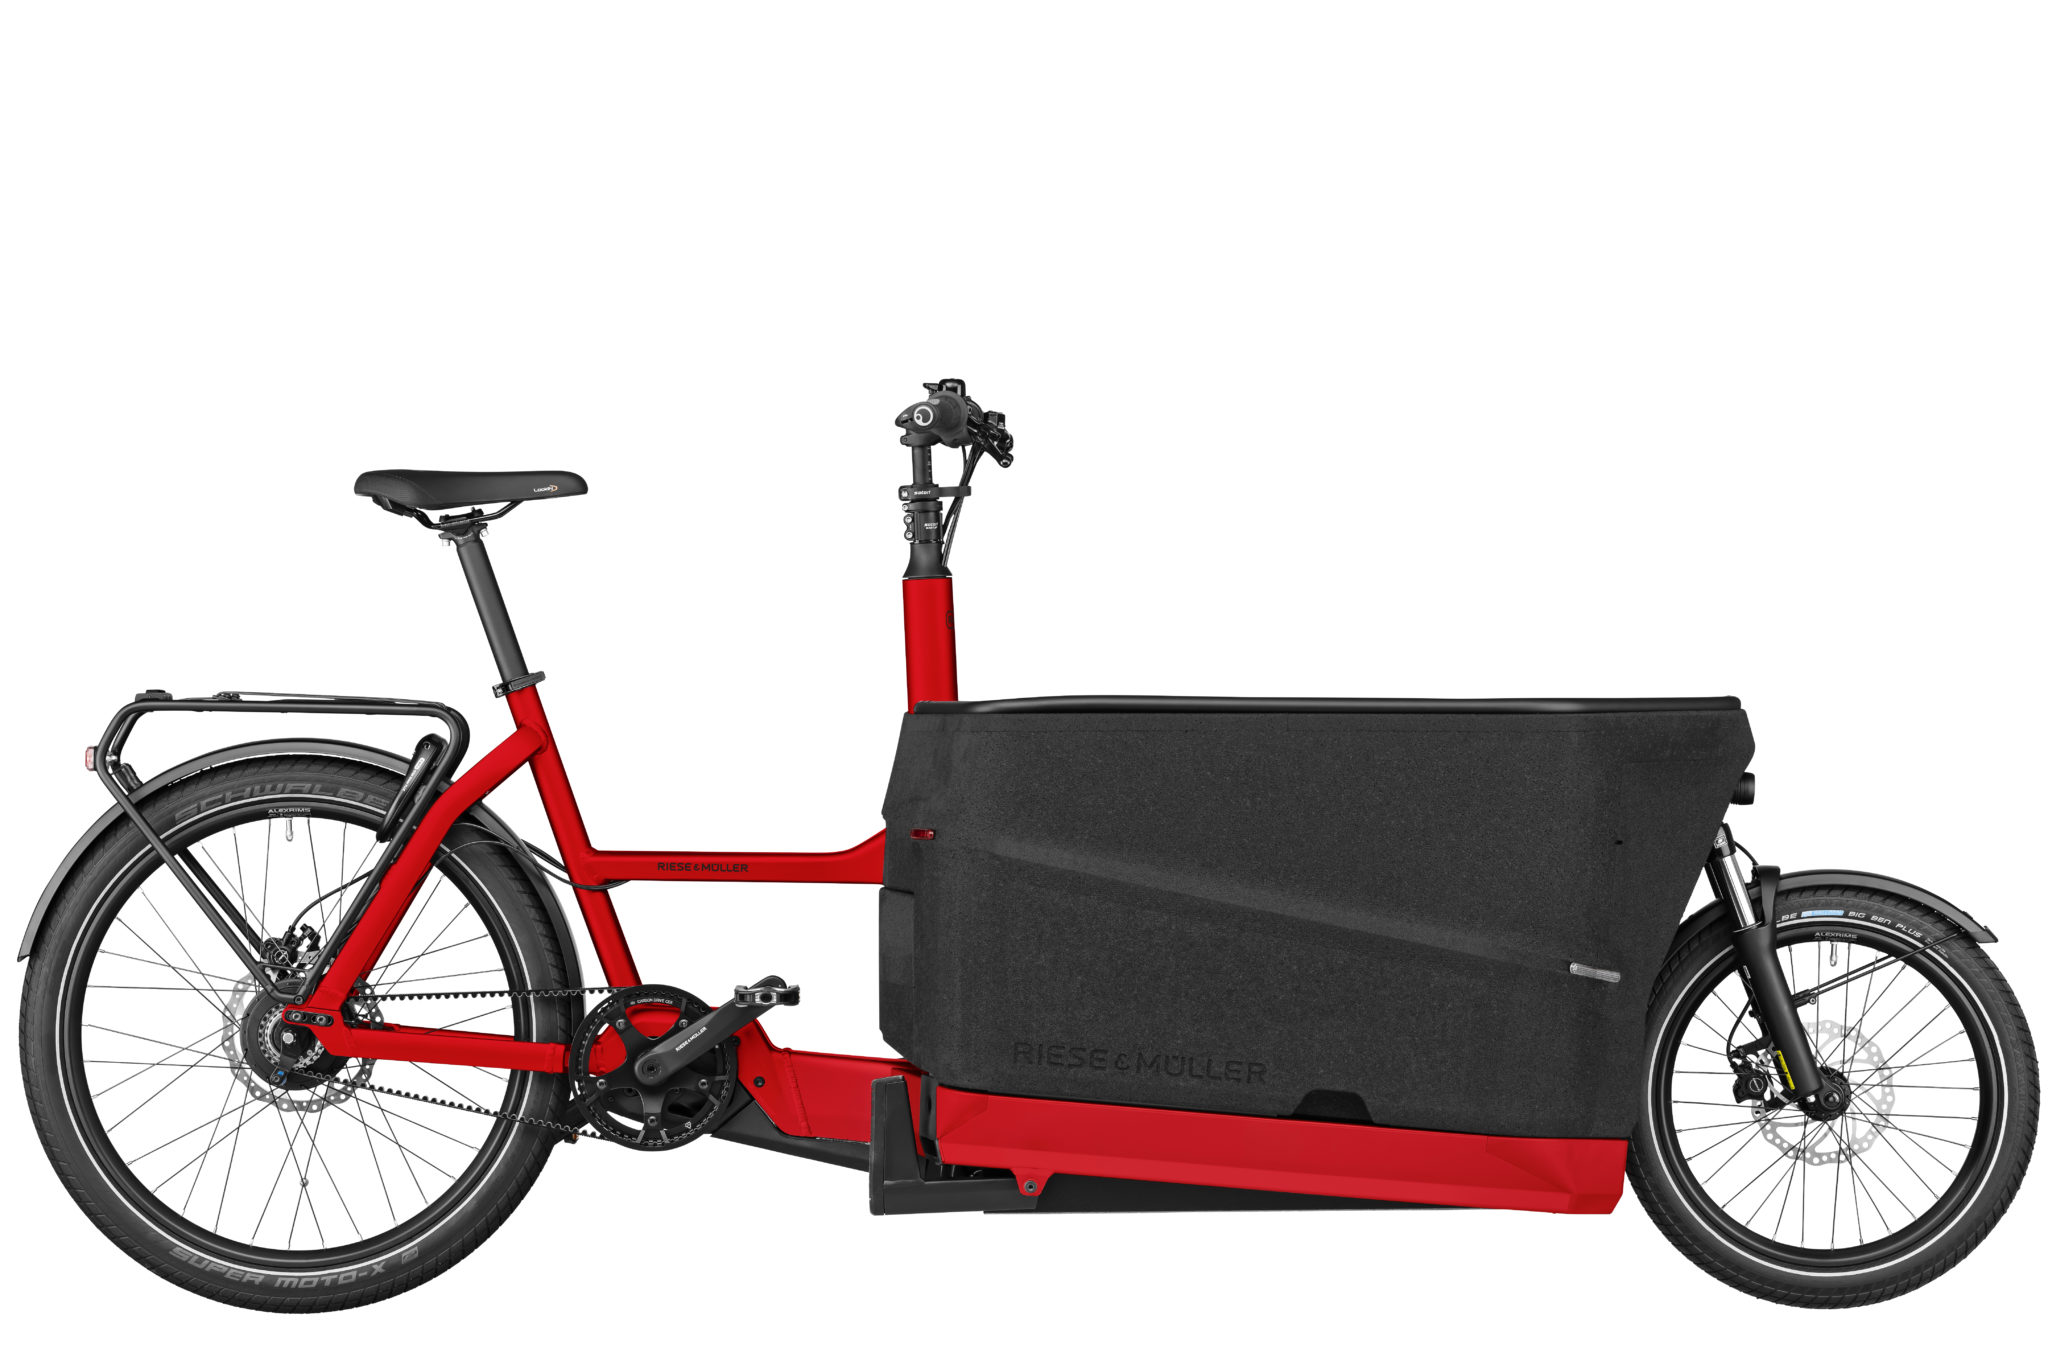 Packster 70 Vario Classic bike